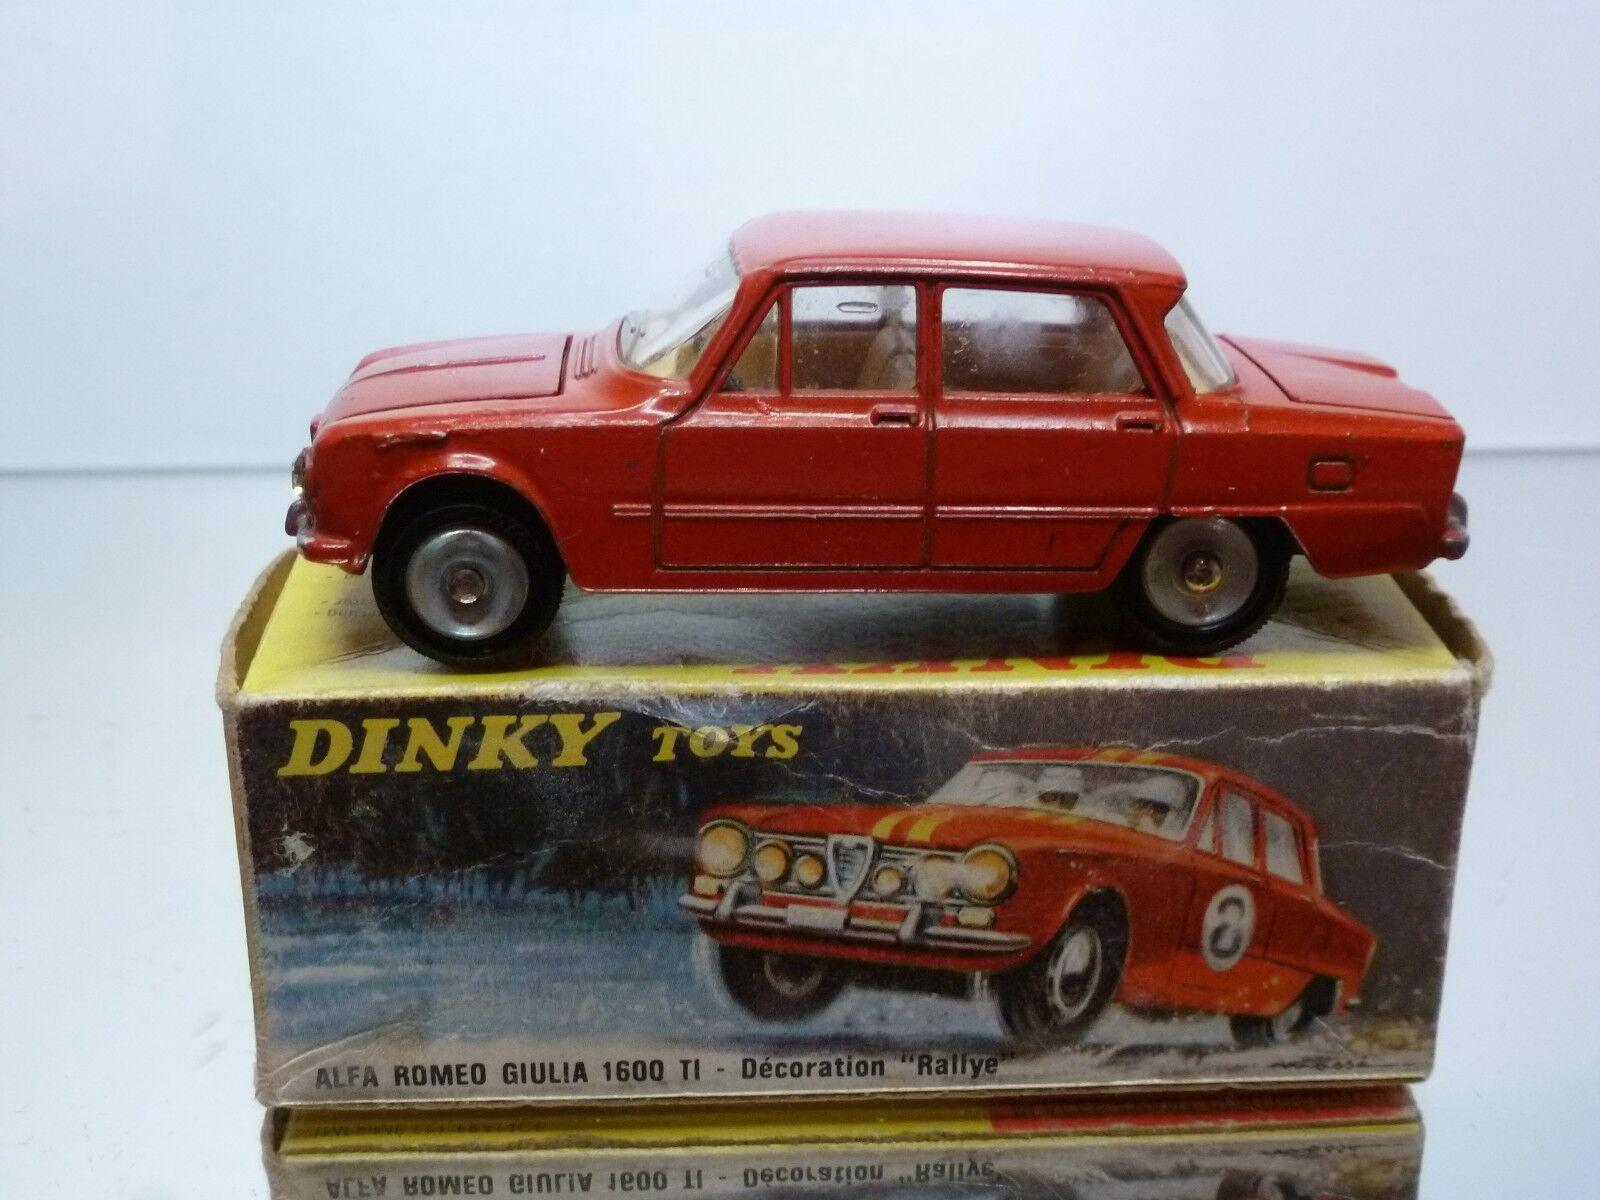 DINKY TOYS 1401 ALFA ROMEO GIULIA 1600 TI - rot 1 43 - GOOD CONDITION IN BOX